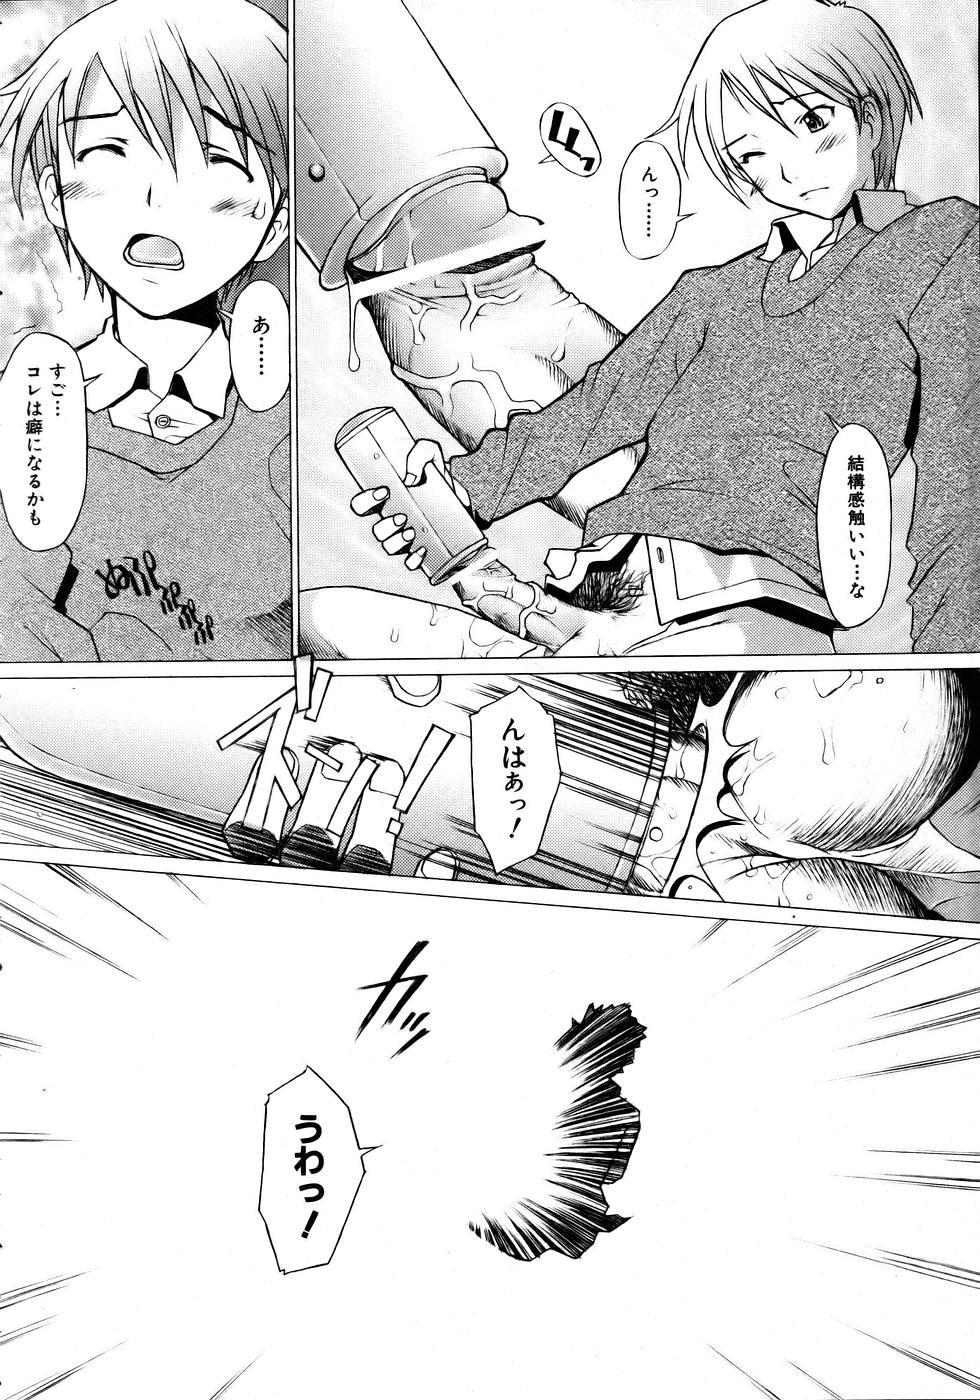 COMIC AUN 2005-12 Vol. 115 167